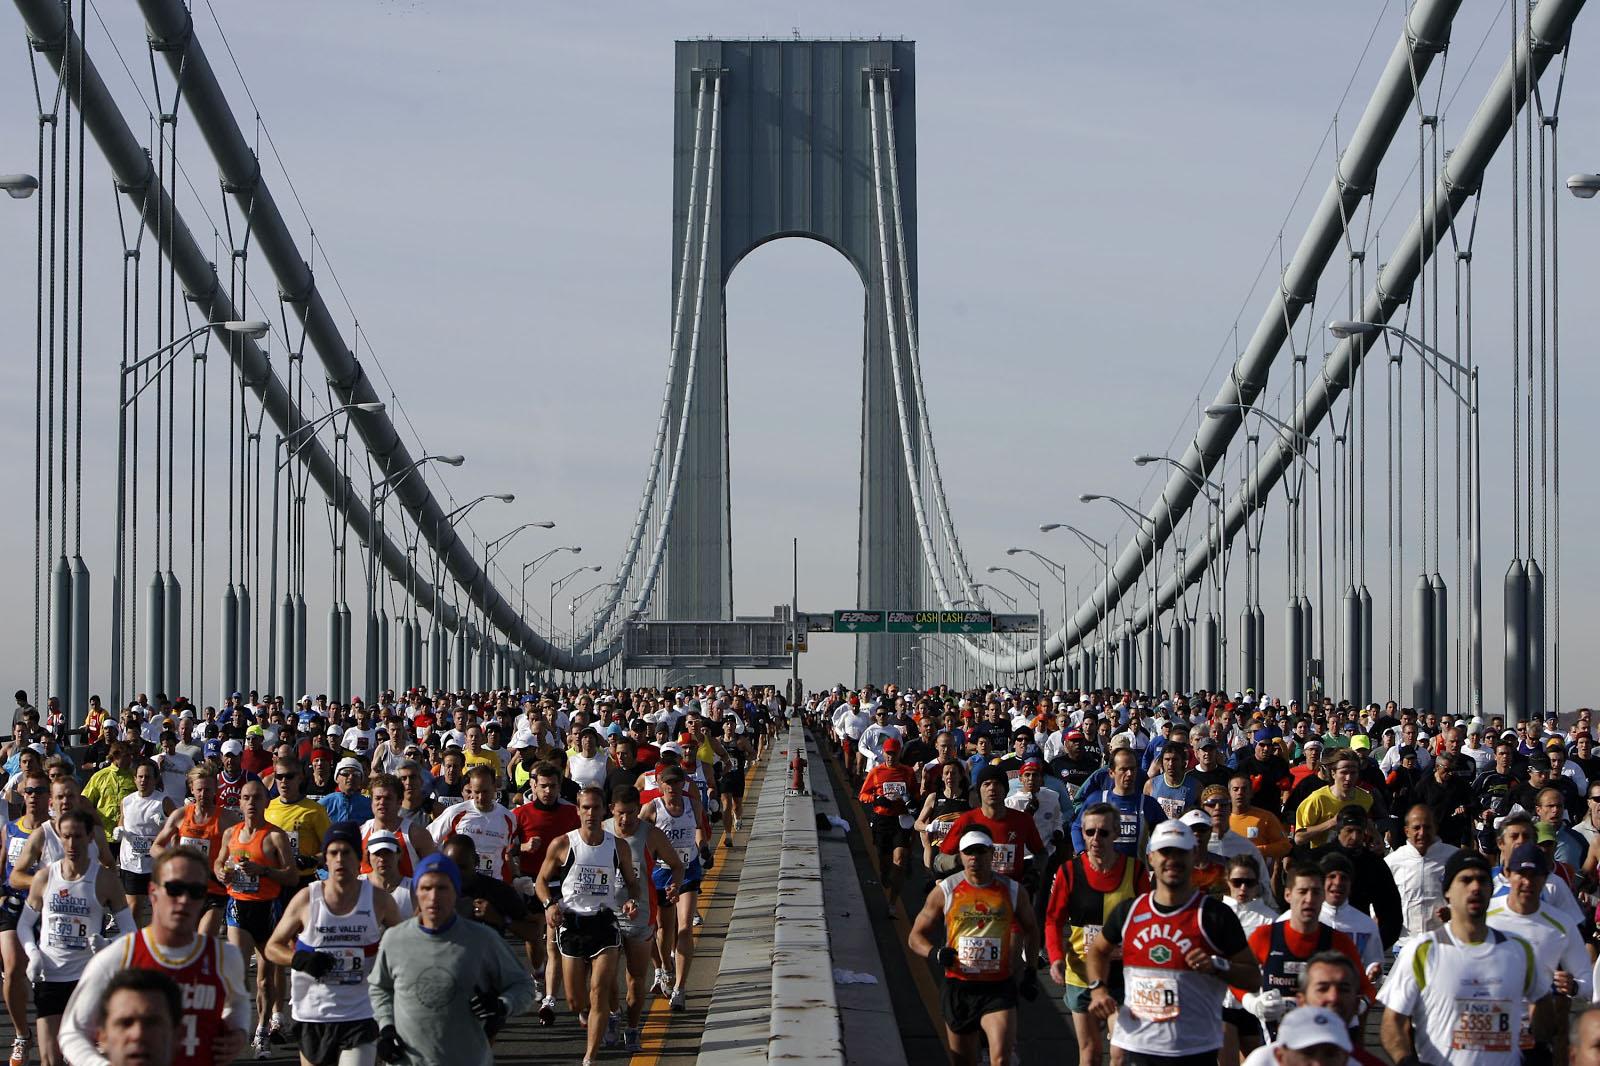 maraton-ny-running-correr-dieta-genetica-nutricion-celular-bioclinica-marbella